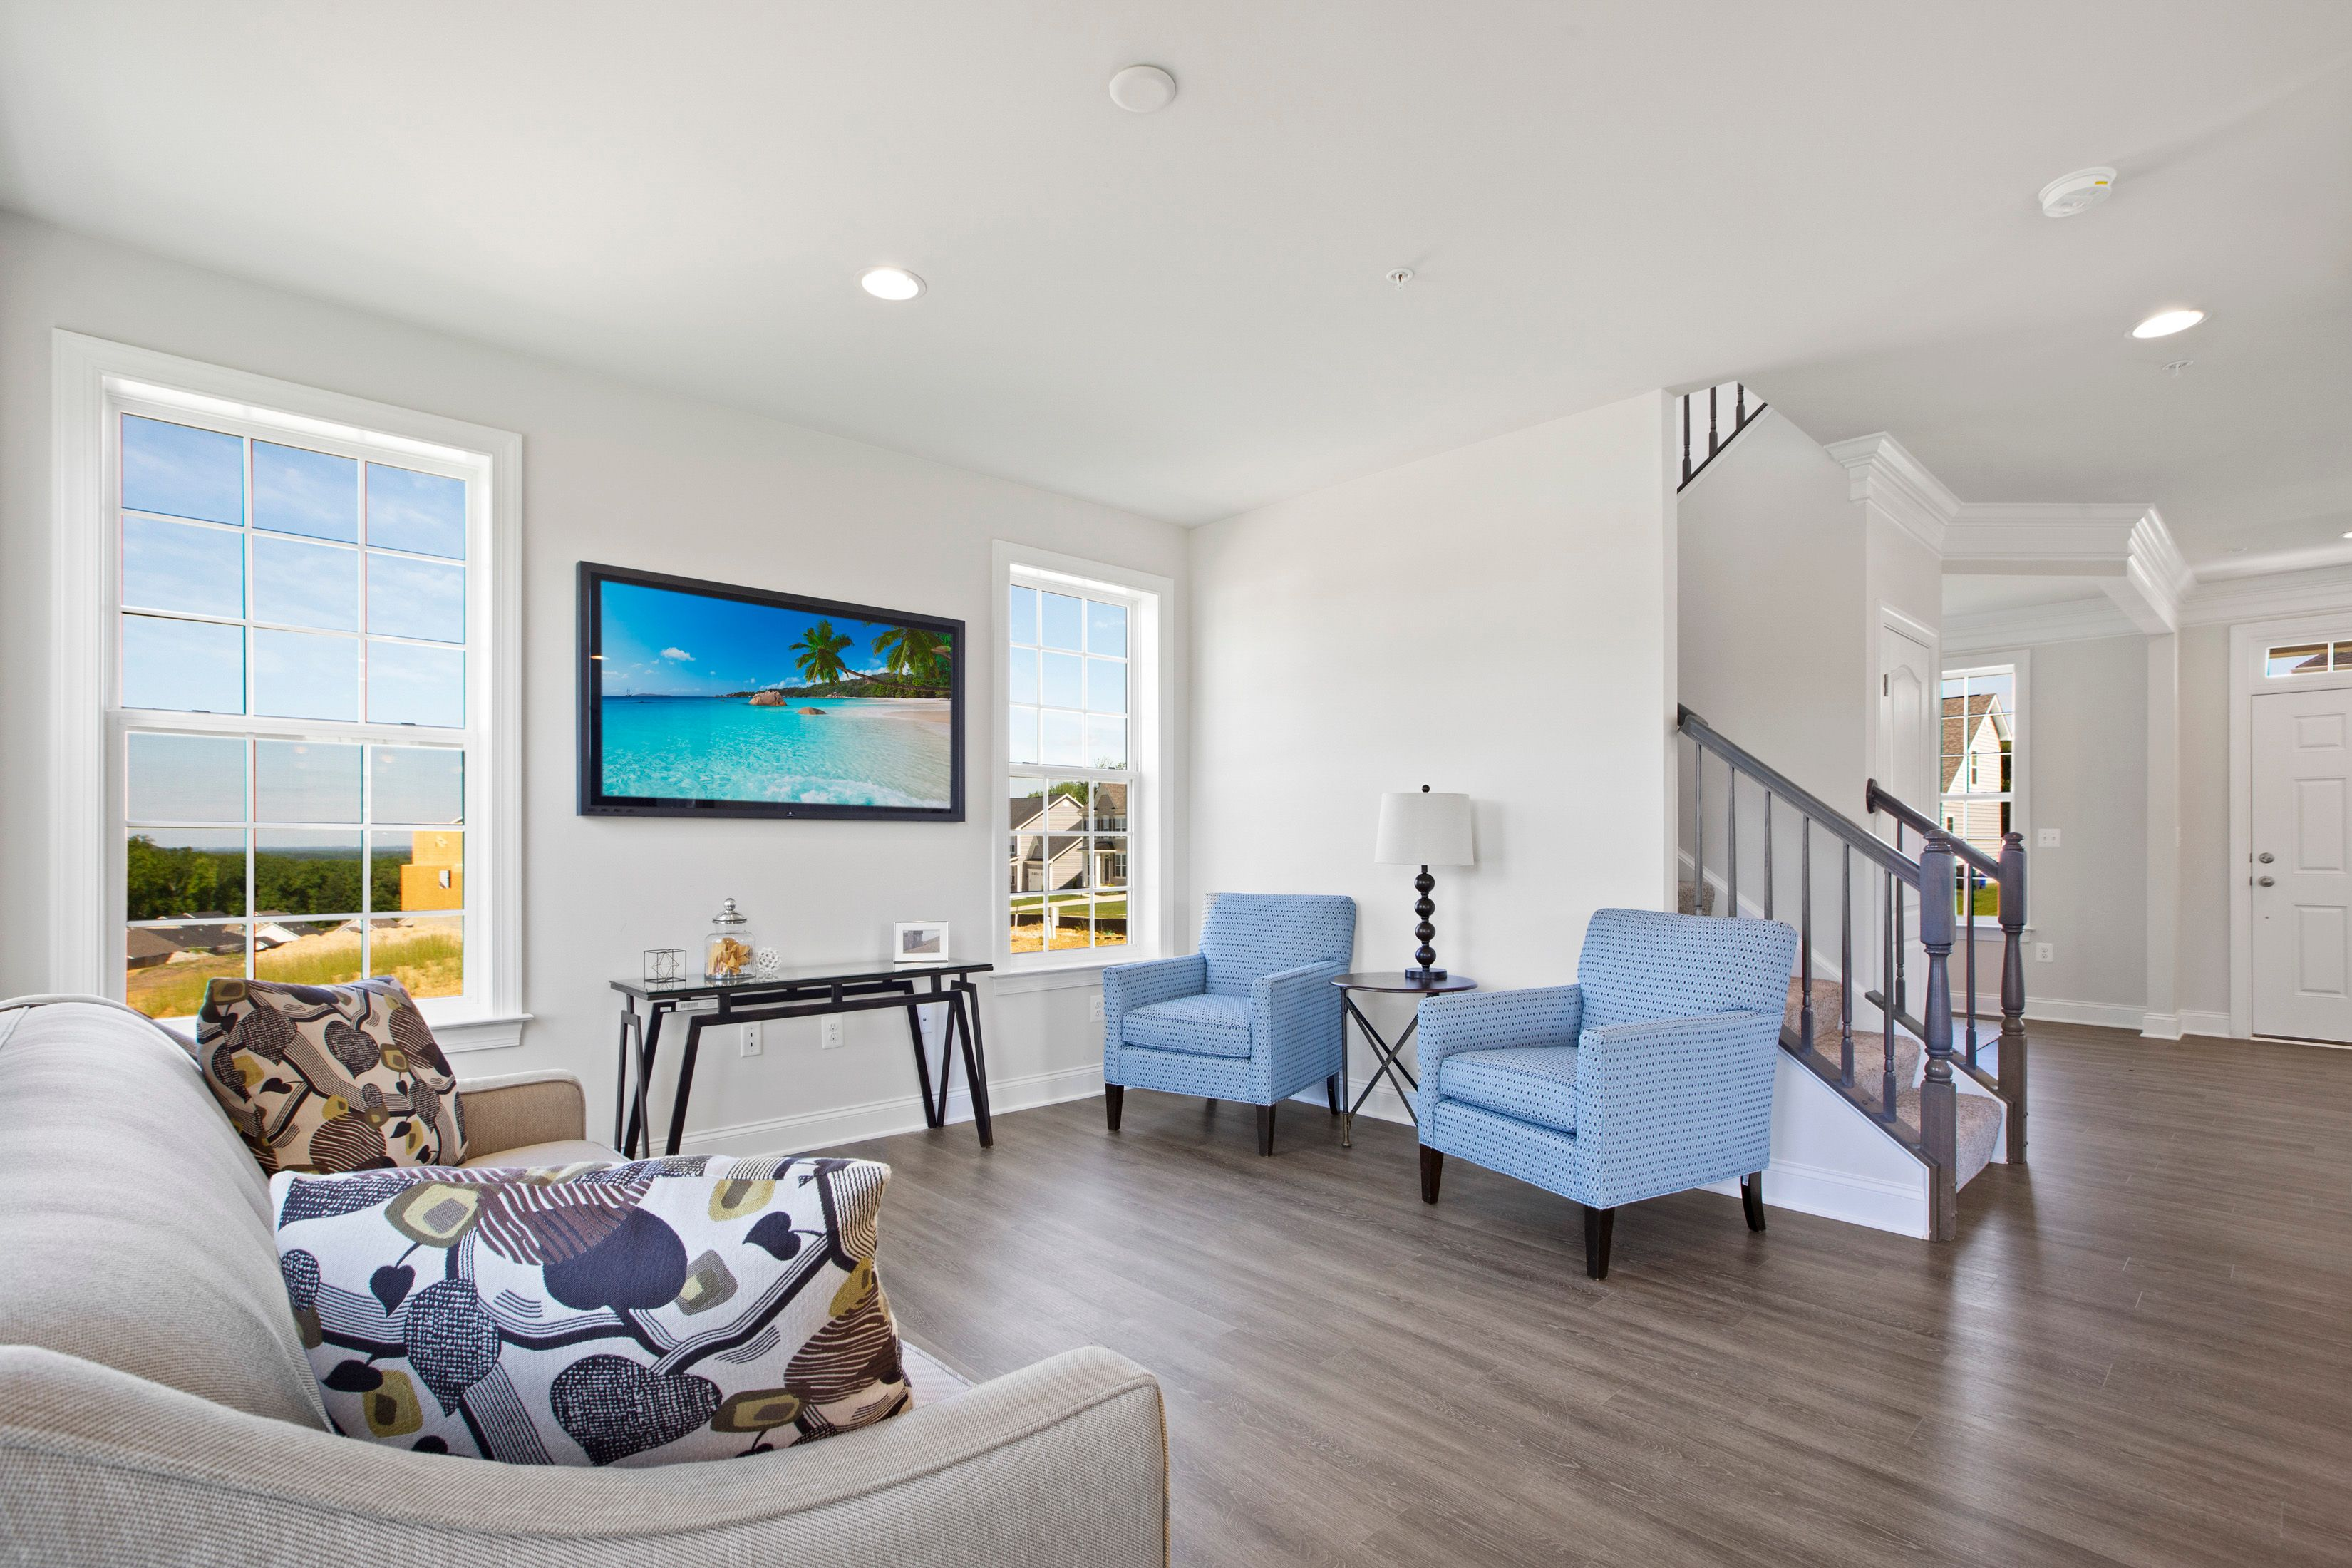 Living Area featured in the Newbury II By Dan Ryan Builders in Hagerstown, MD